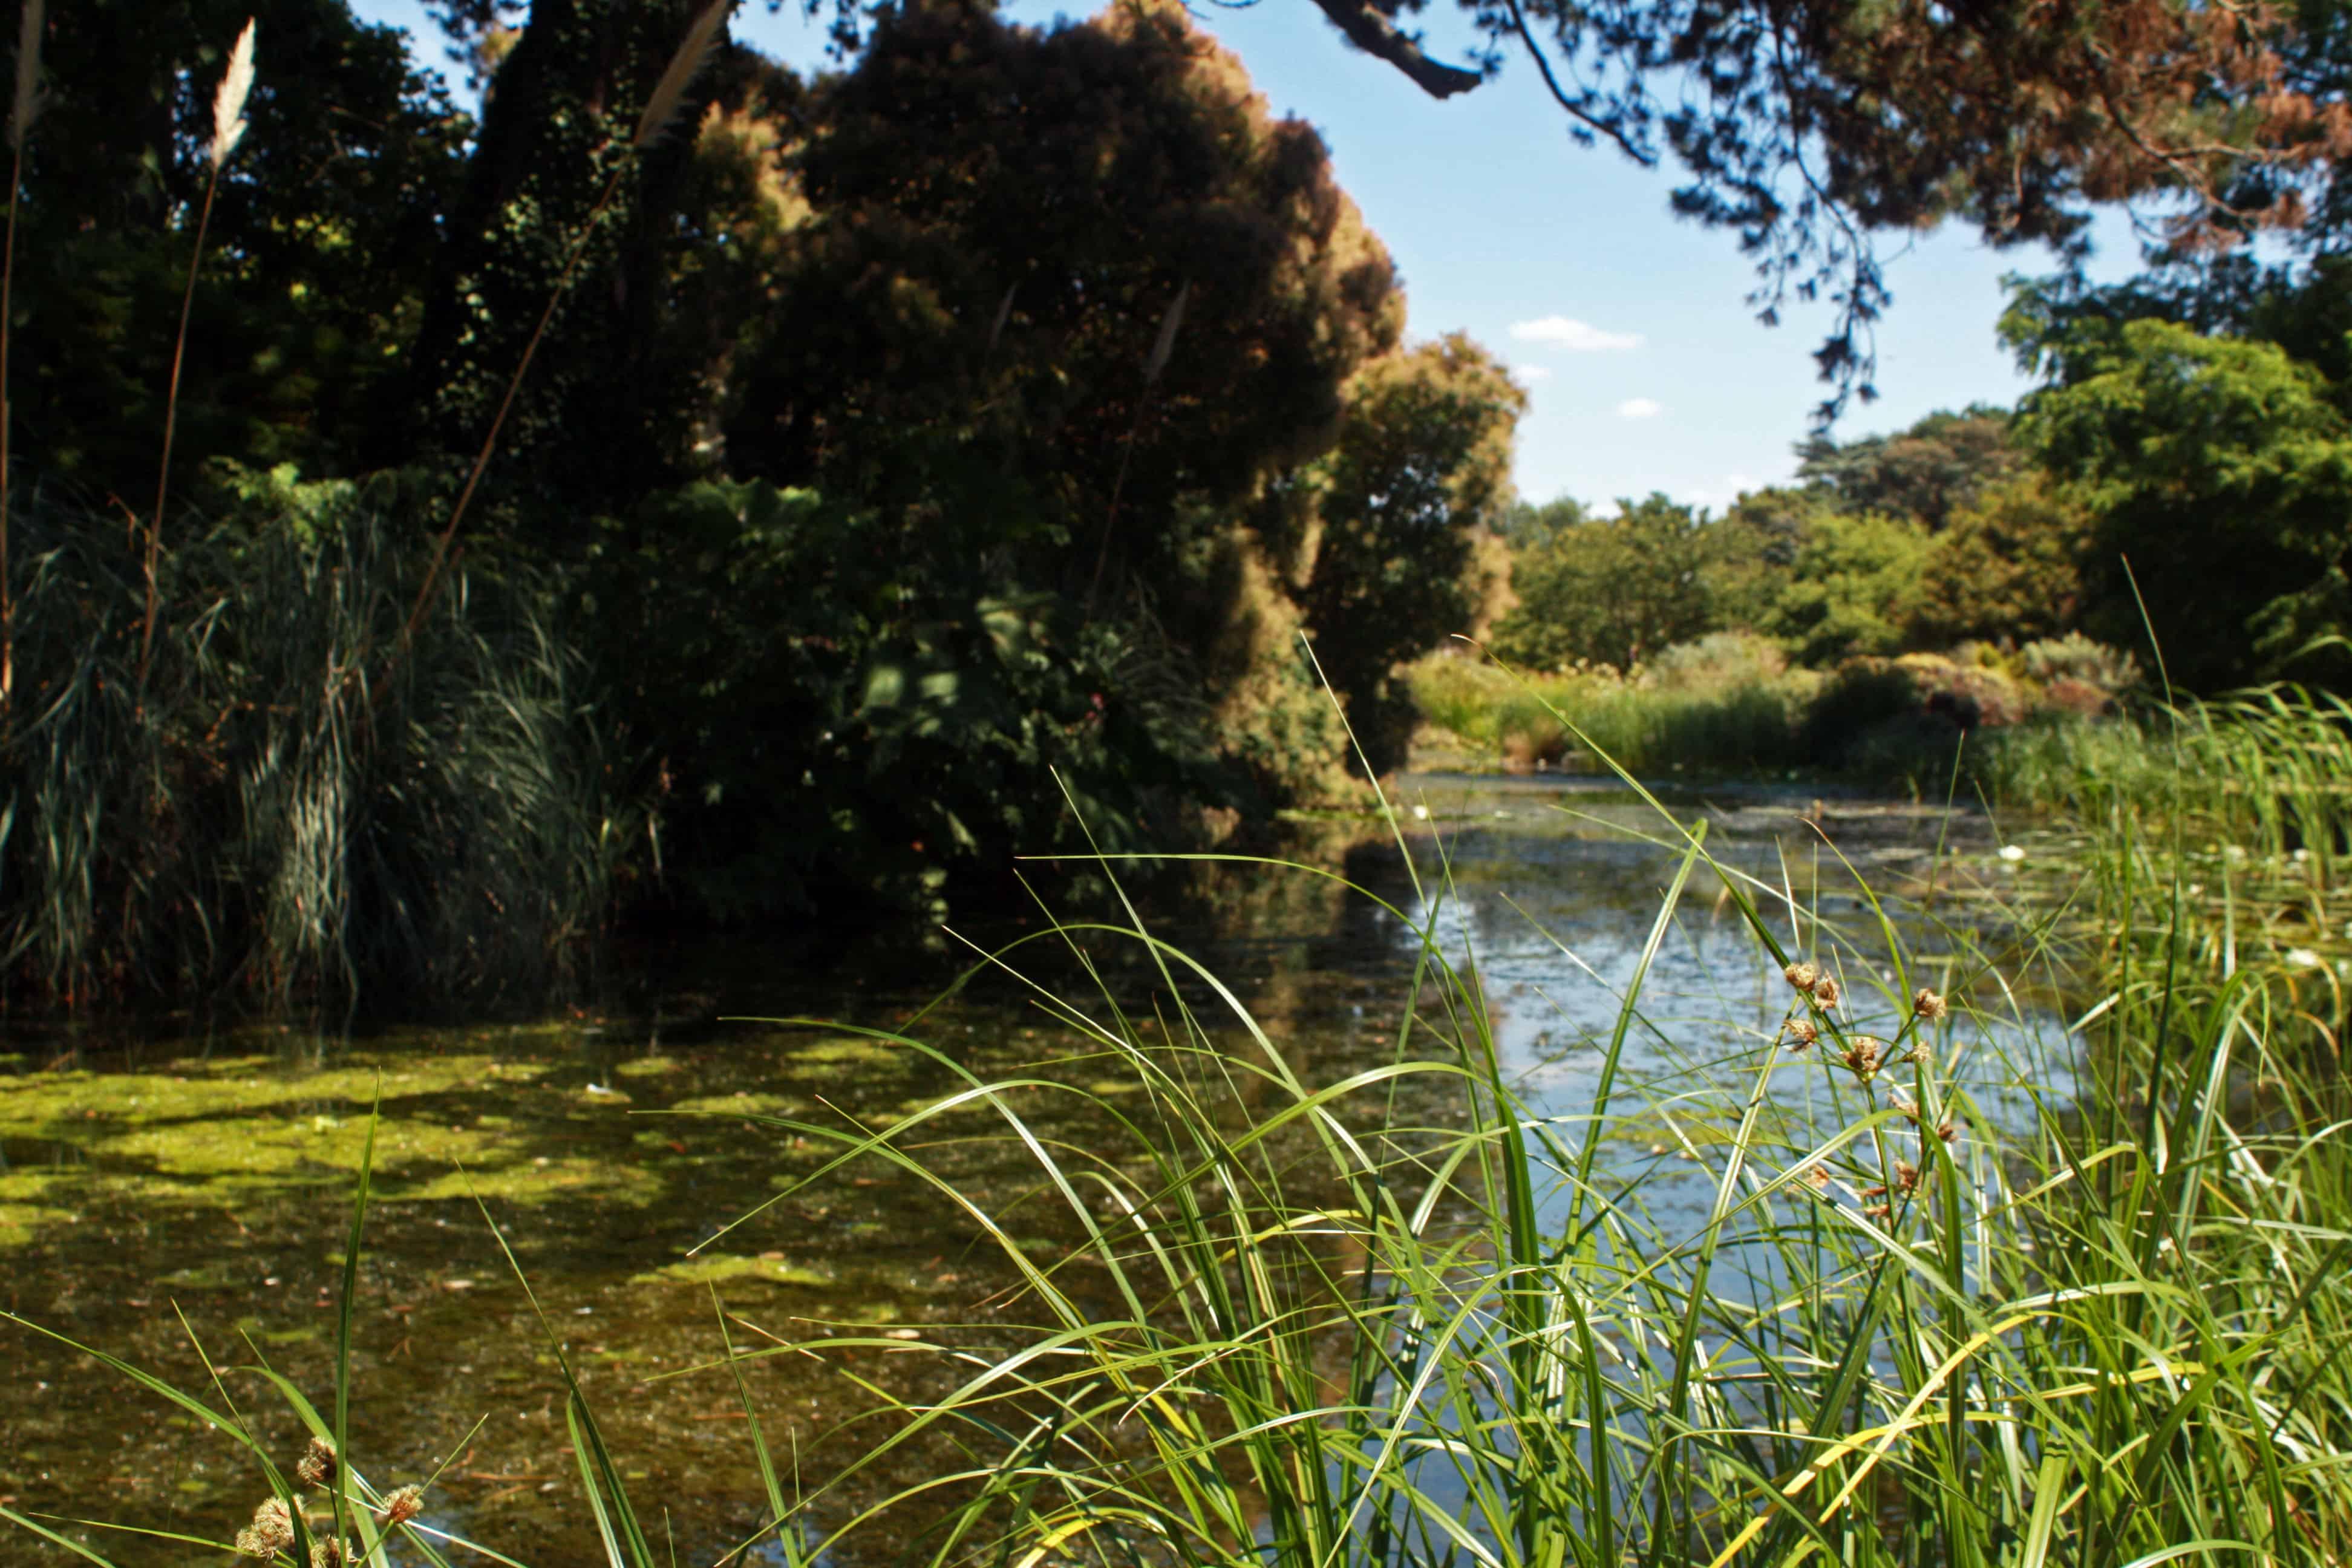 Pond in Cambridge University Botanic Garden